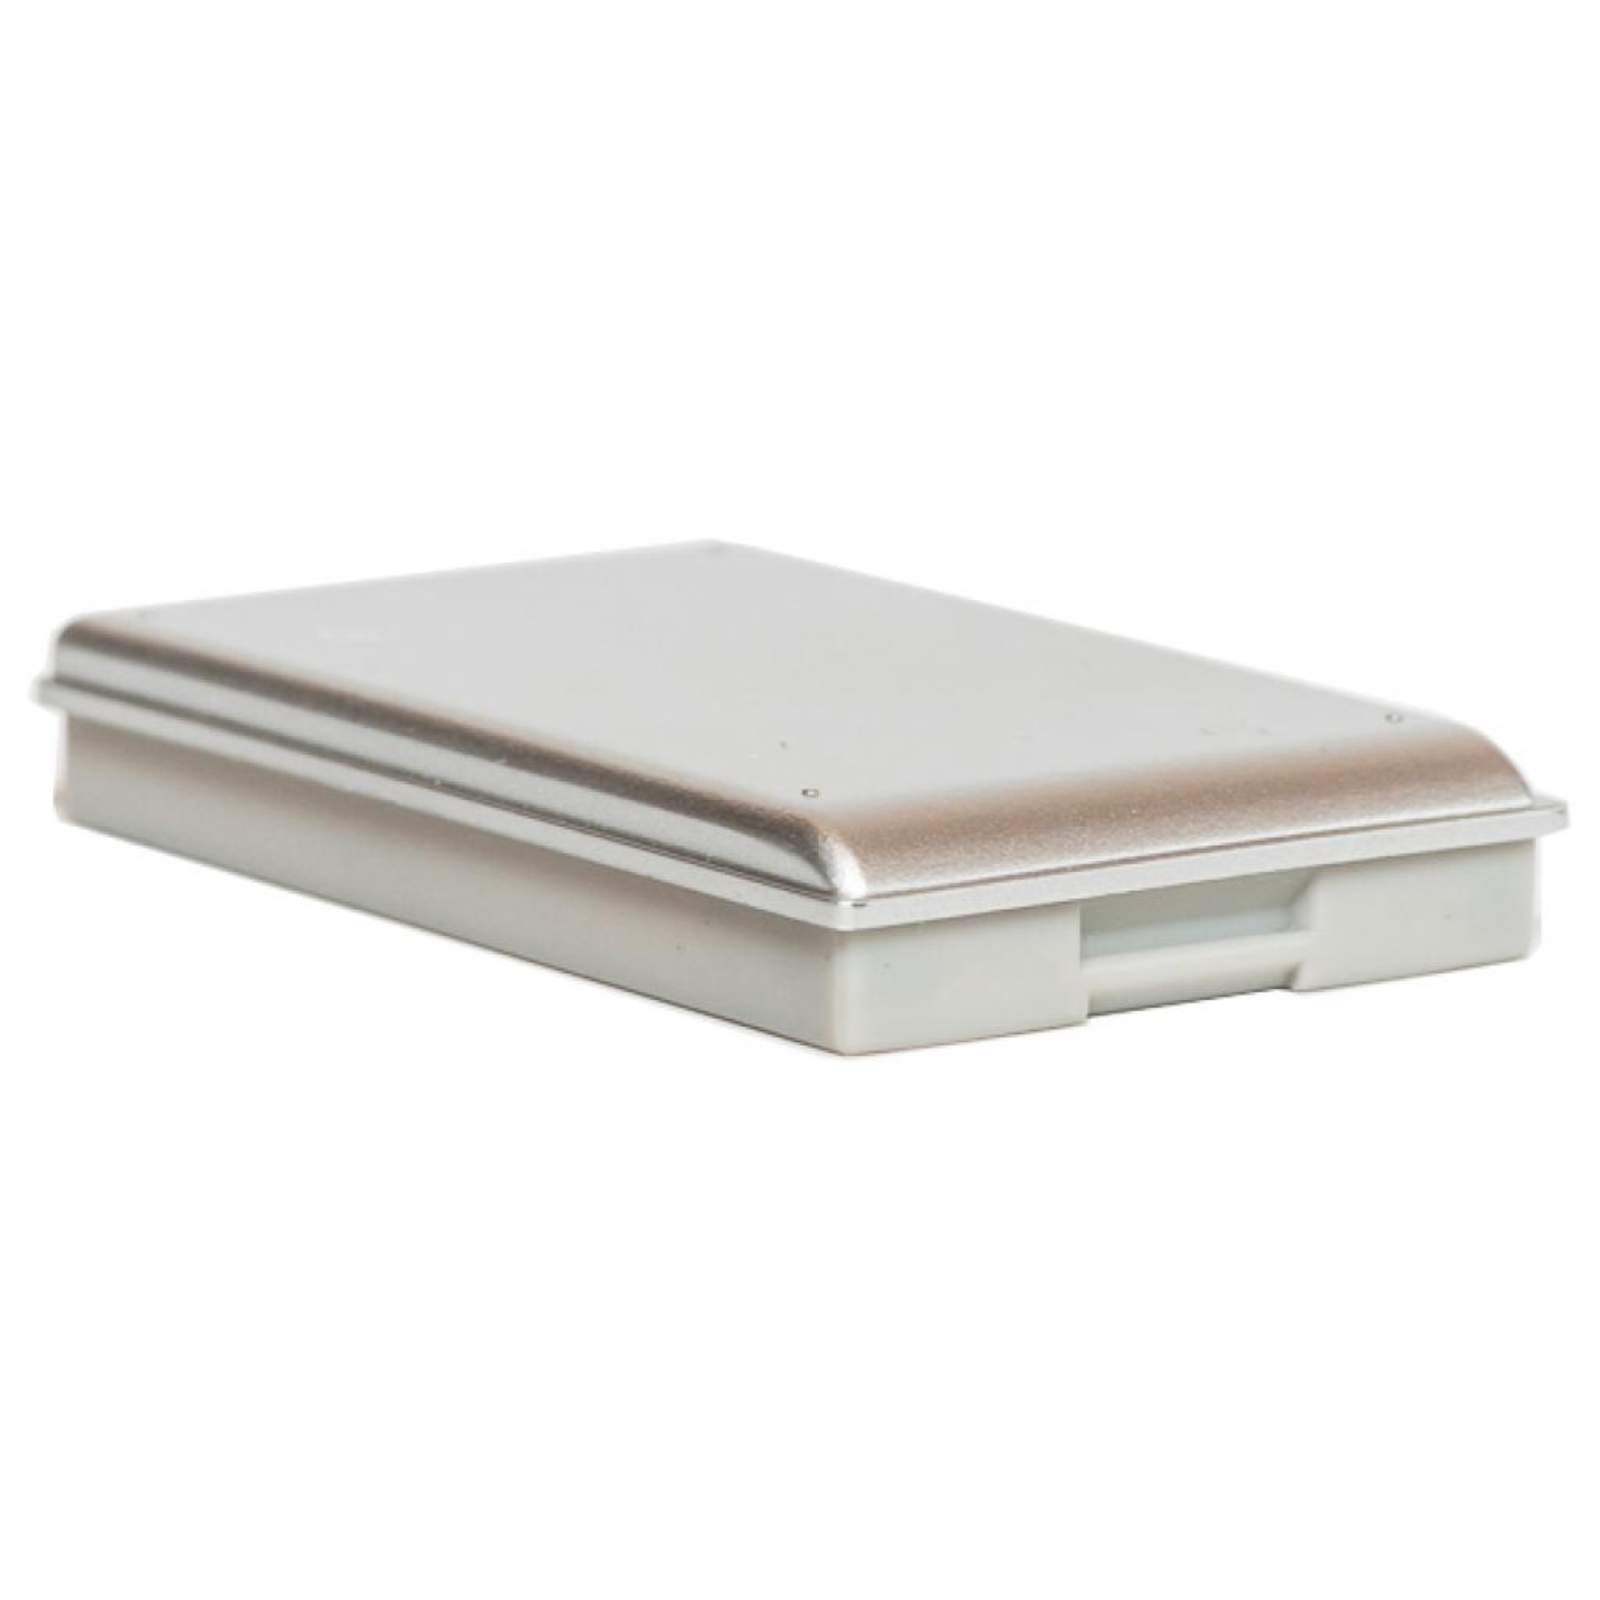 Аккумулятор к фото/видео PowerPlant Samsung SB-P90A (DV00DV1363) изображение 2